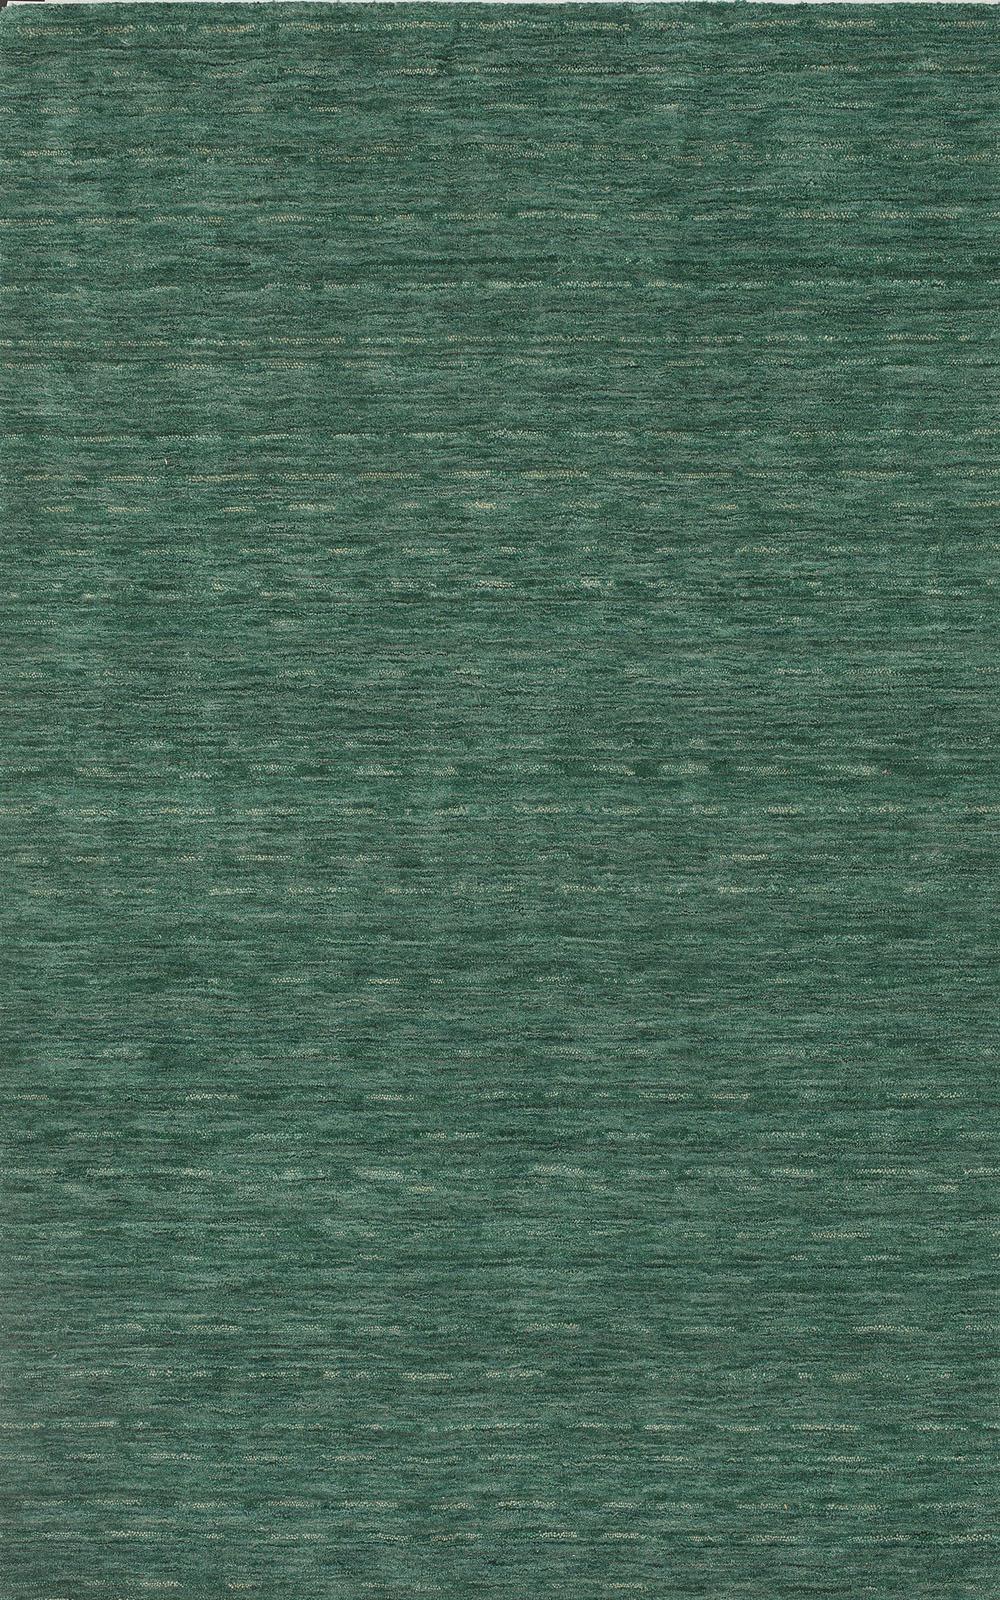 Rafia Emerald Dyed Wool Pile Rug Textured Plush